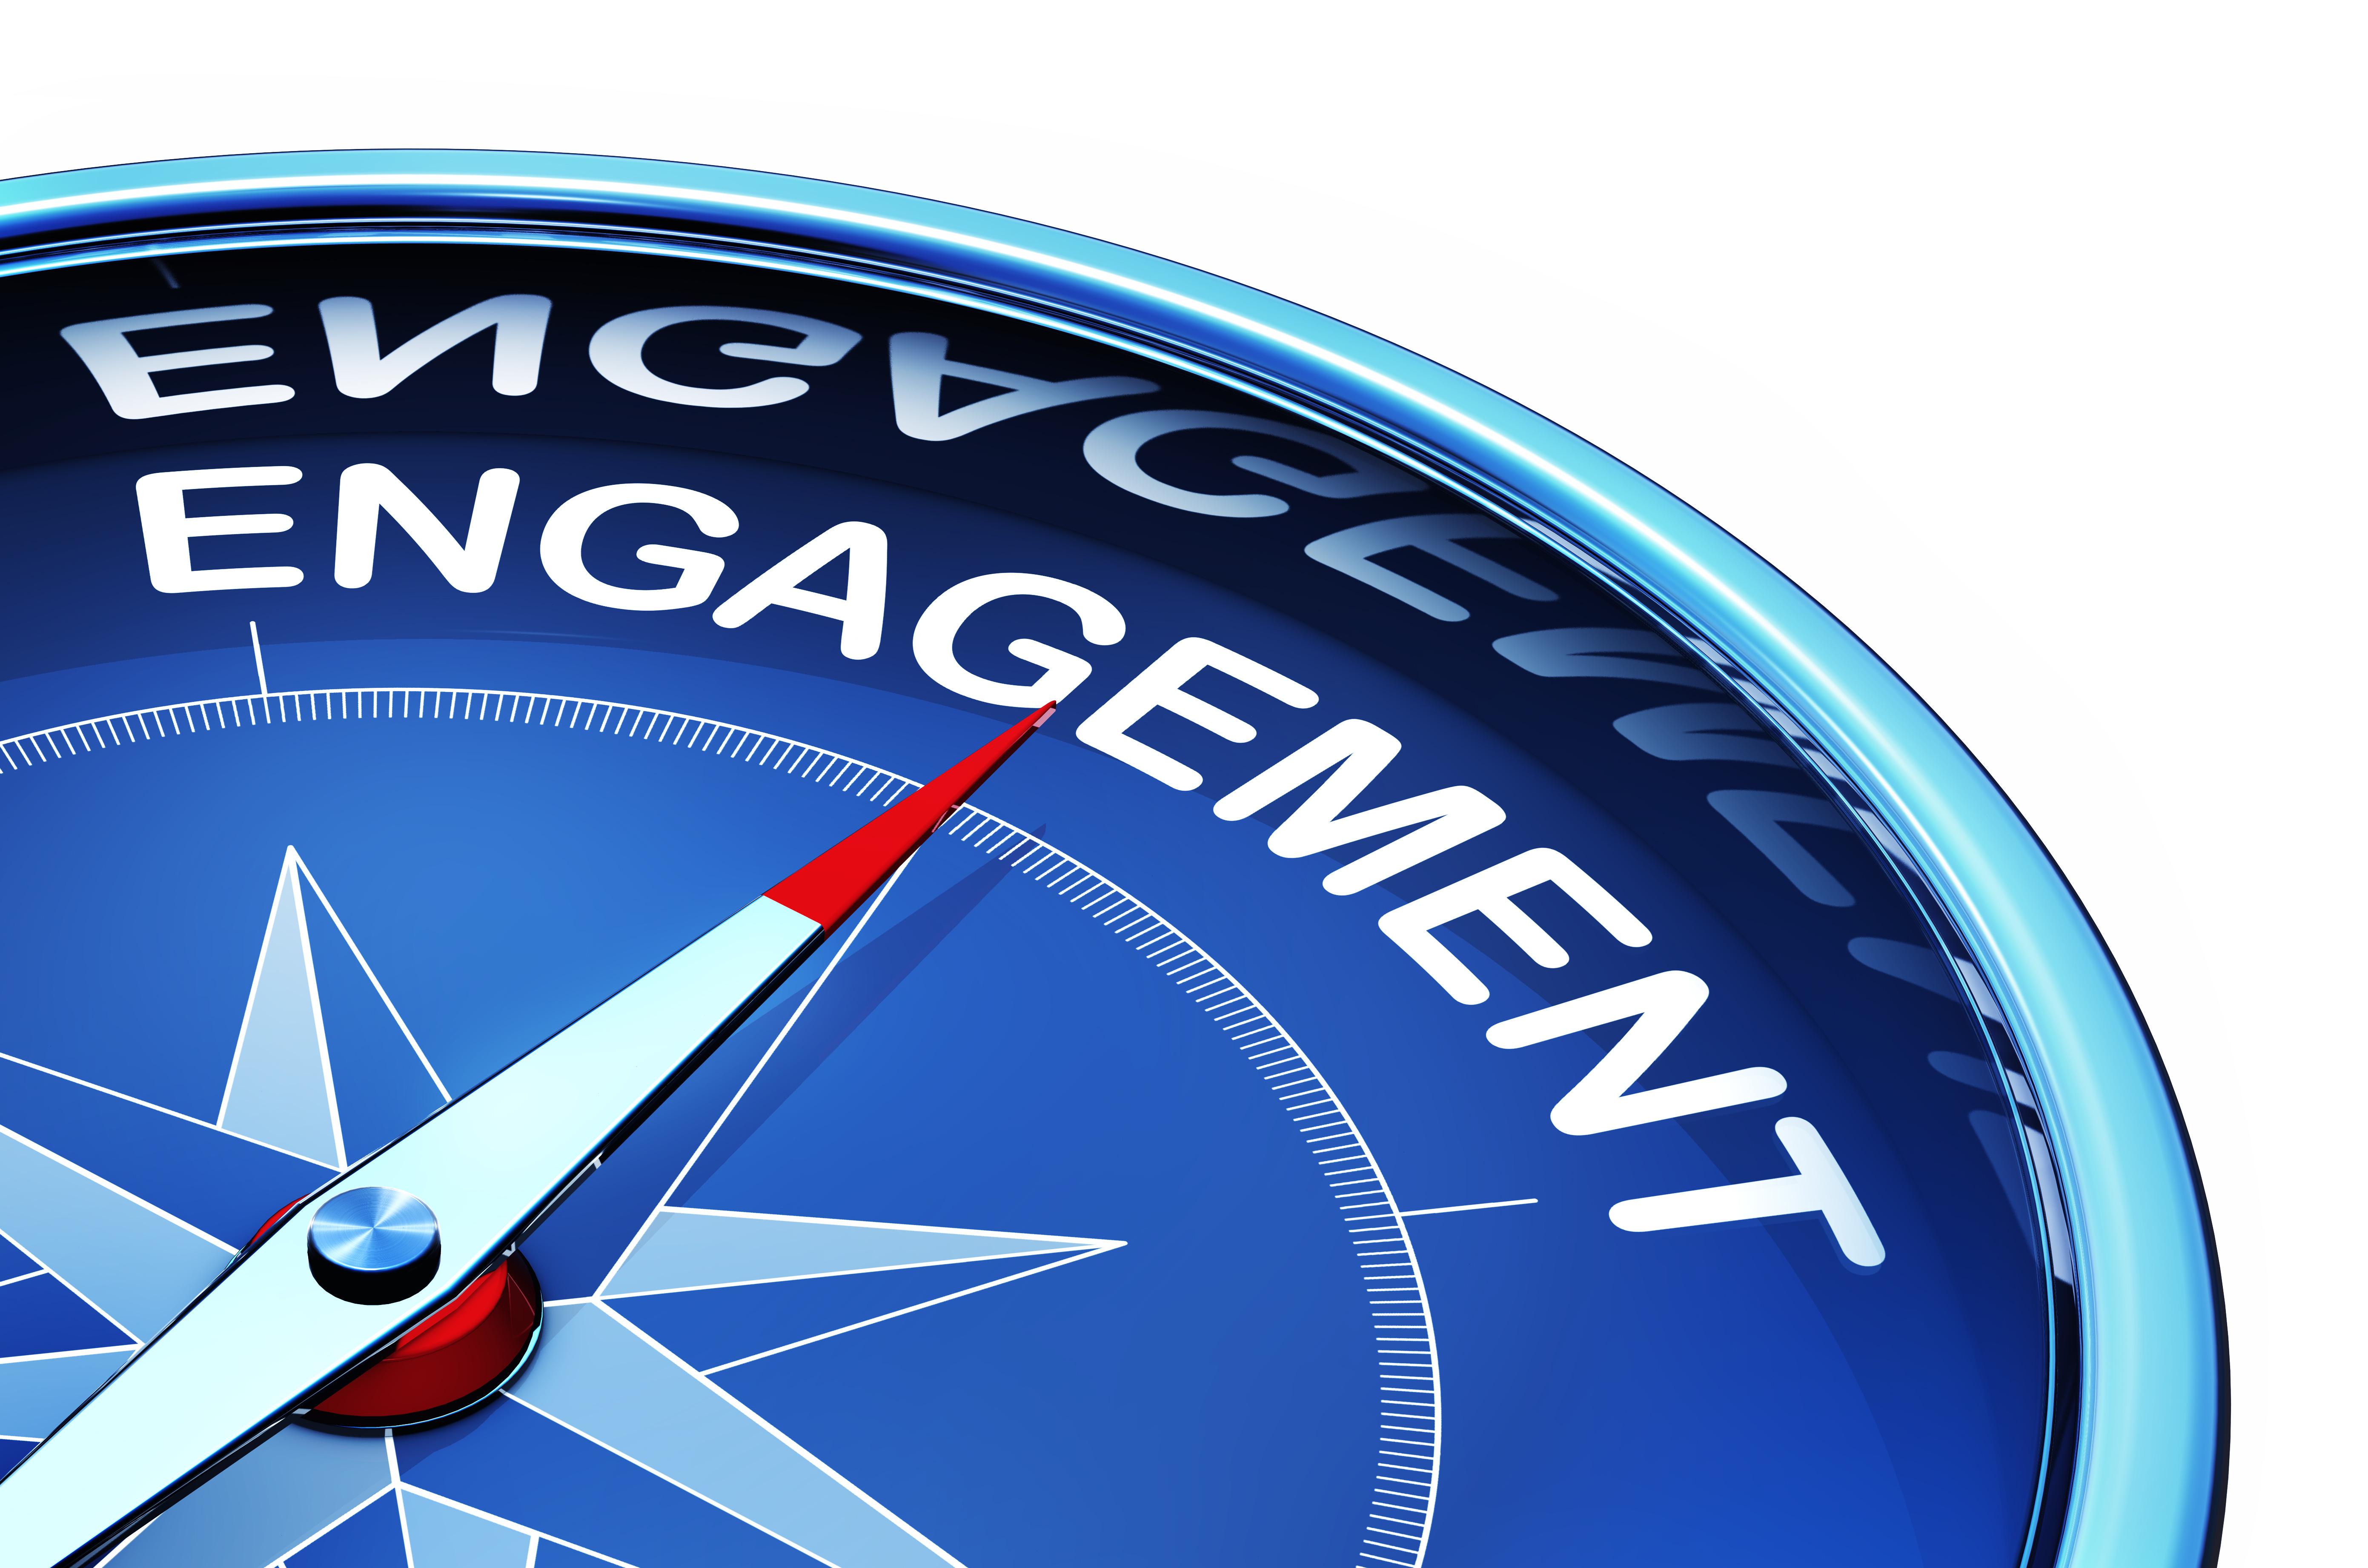 Employee Engagement Software for Organization Success